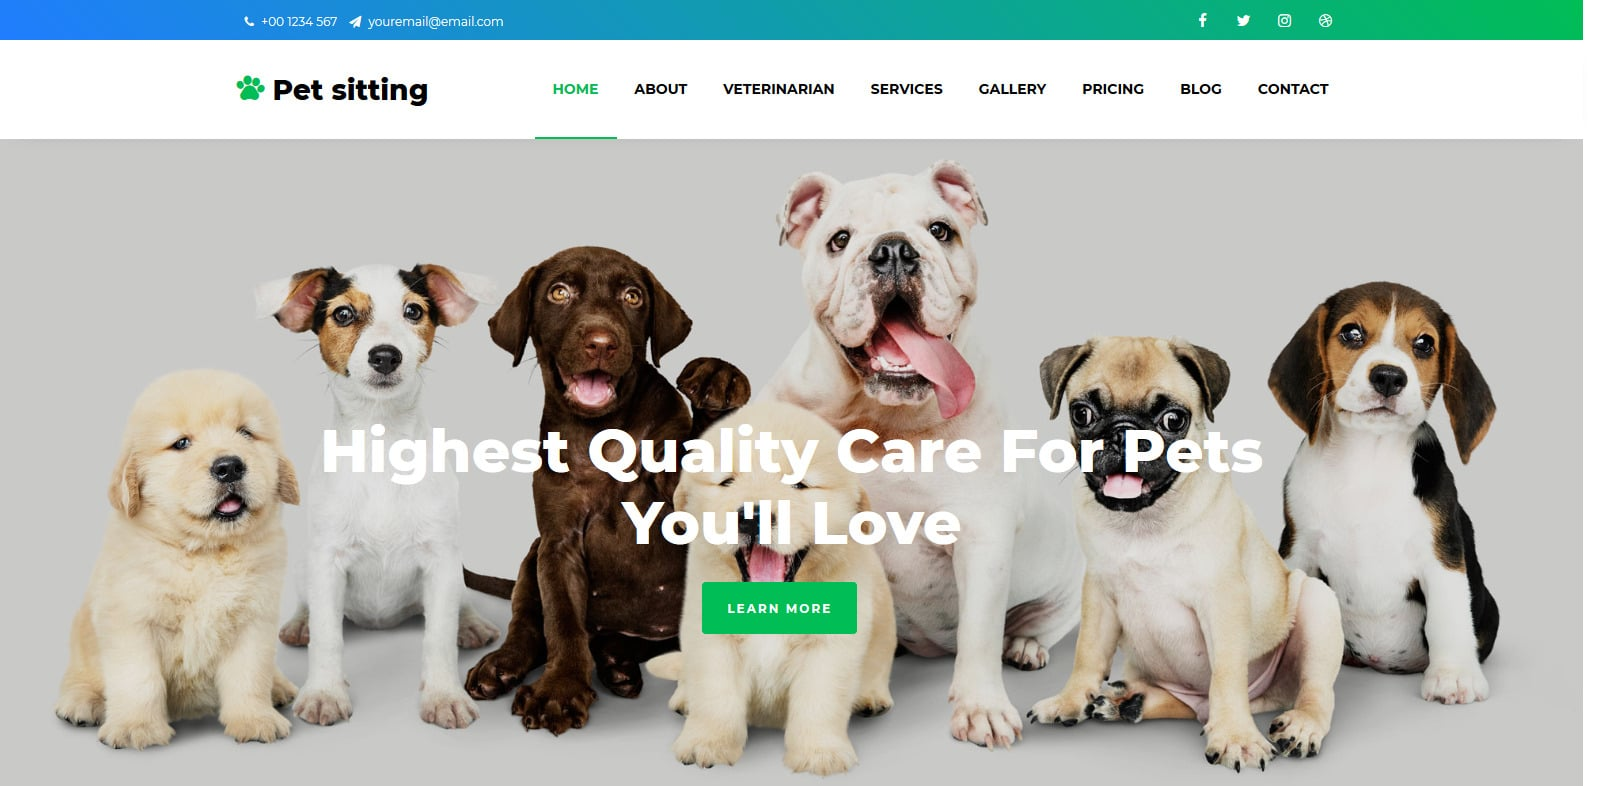 pet-sitting-animal-website-template